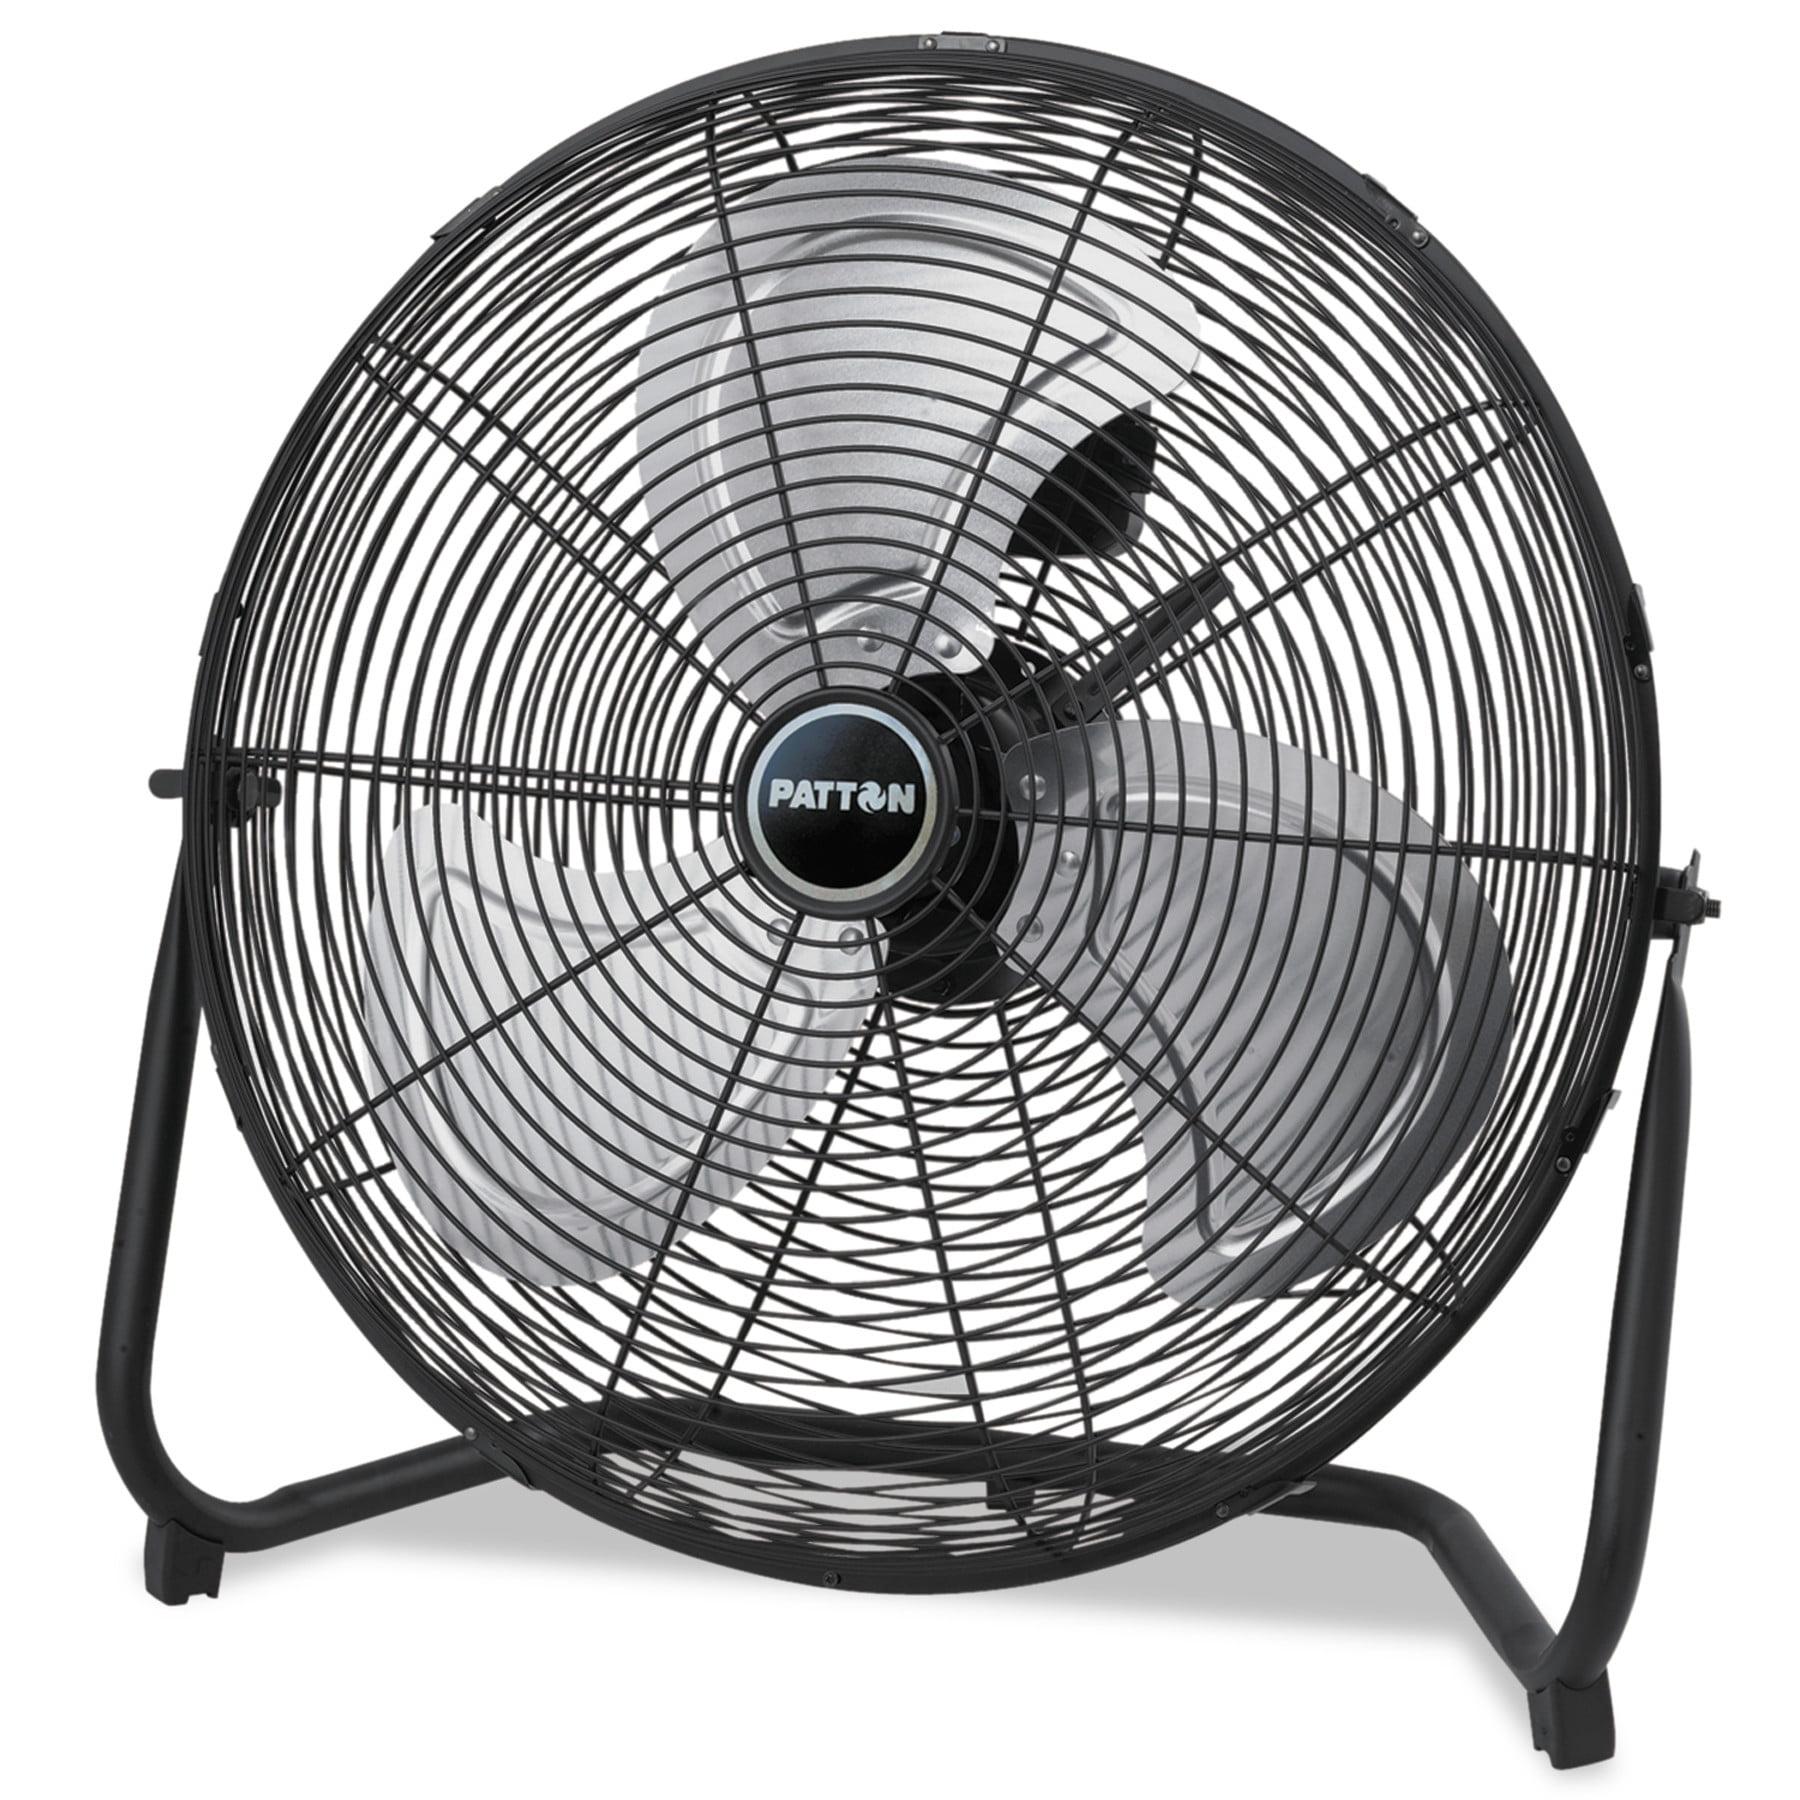 "Patton High Velocity Fan, Three-Speed, Black, 20"" 1/2""W x 8 5/8""H"